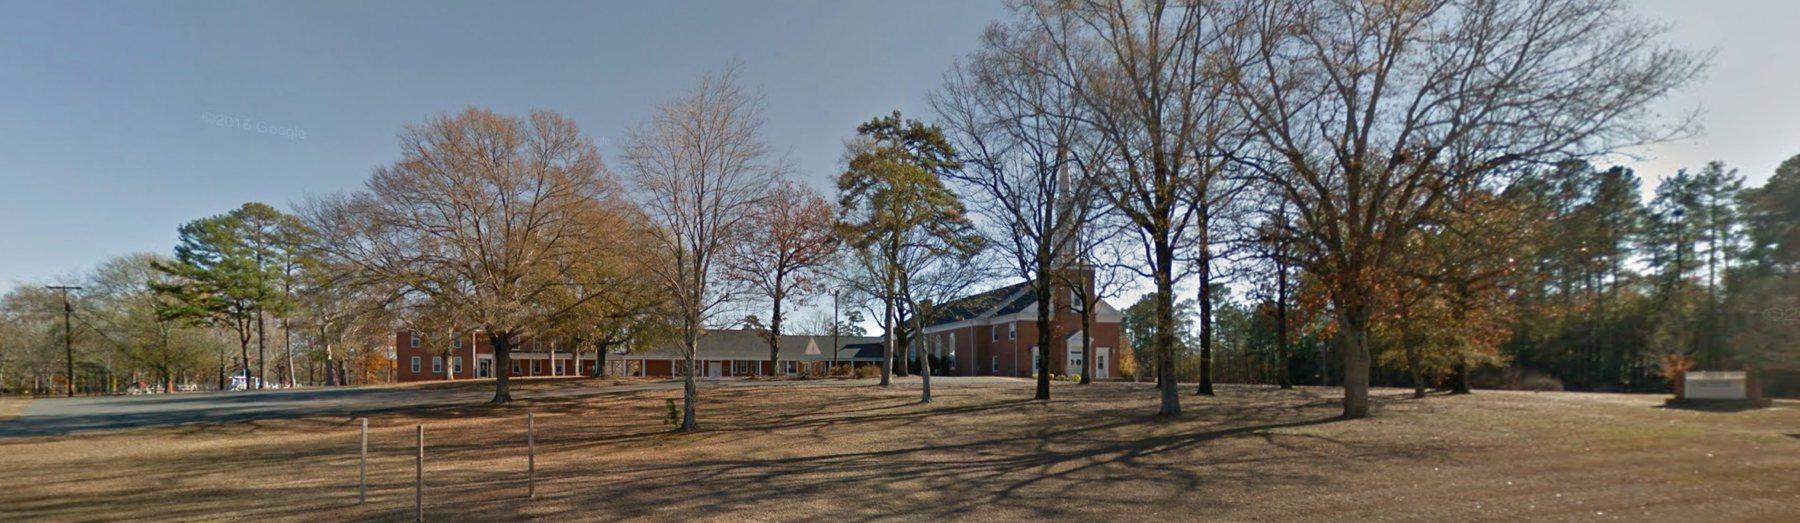 new-hope-baptist-church-rock-hill-south-carolina